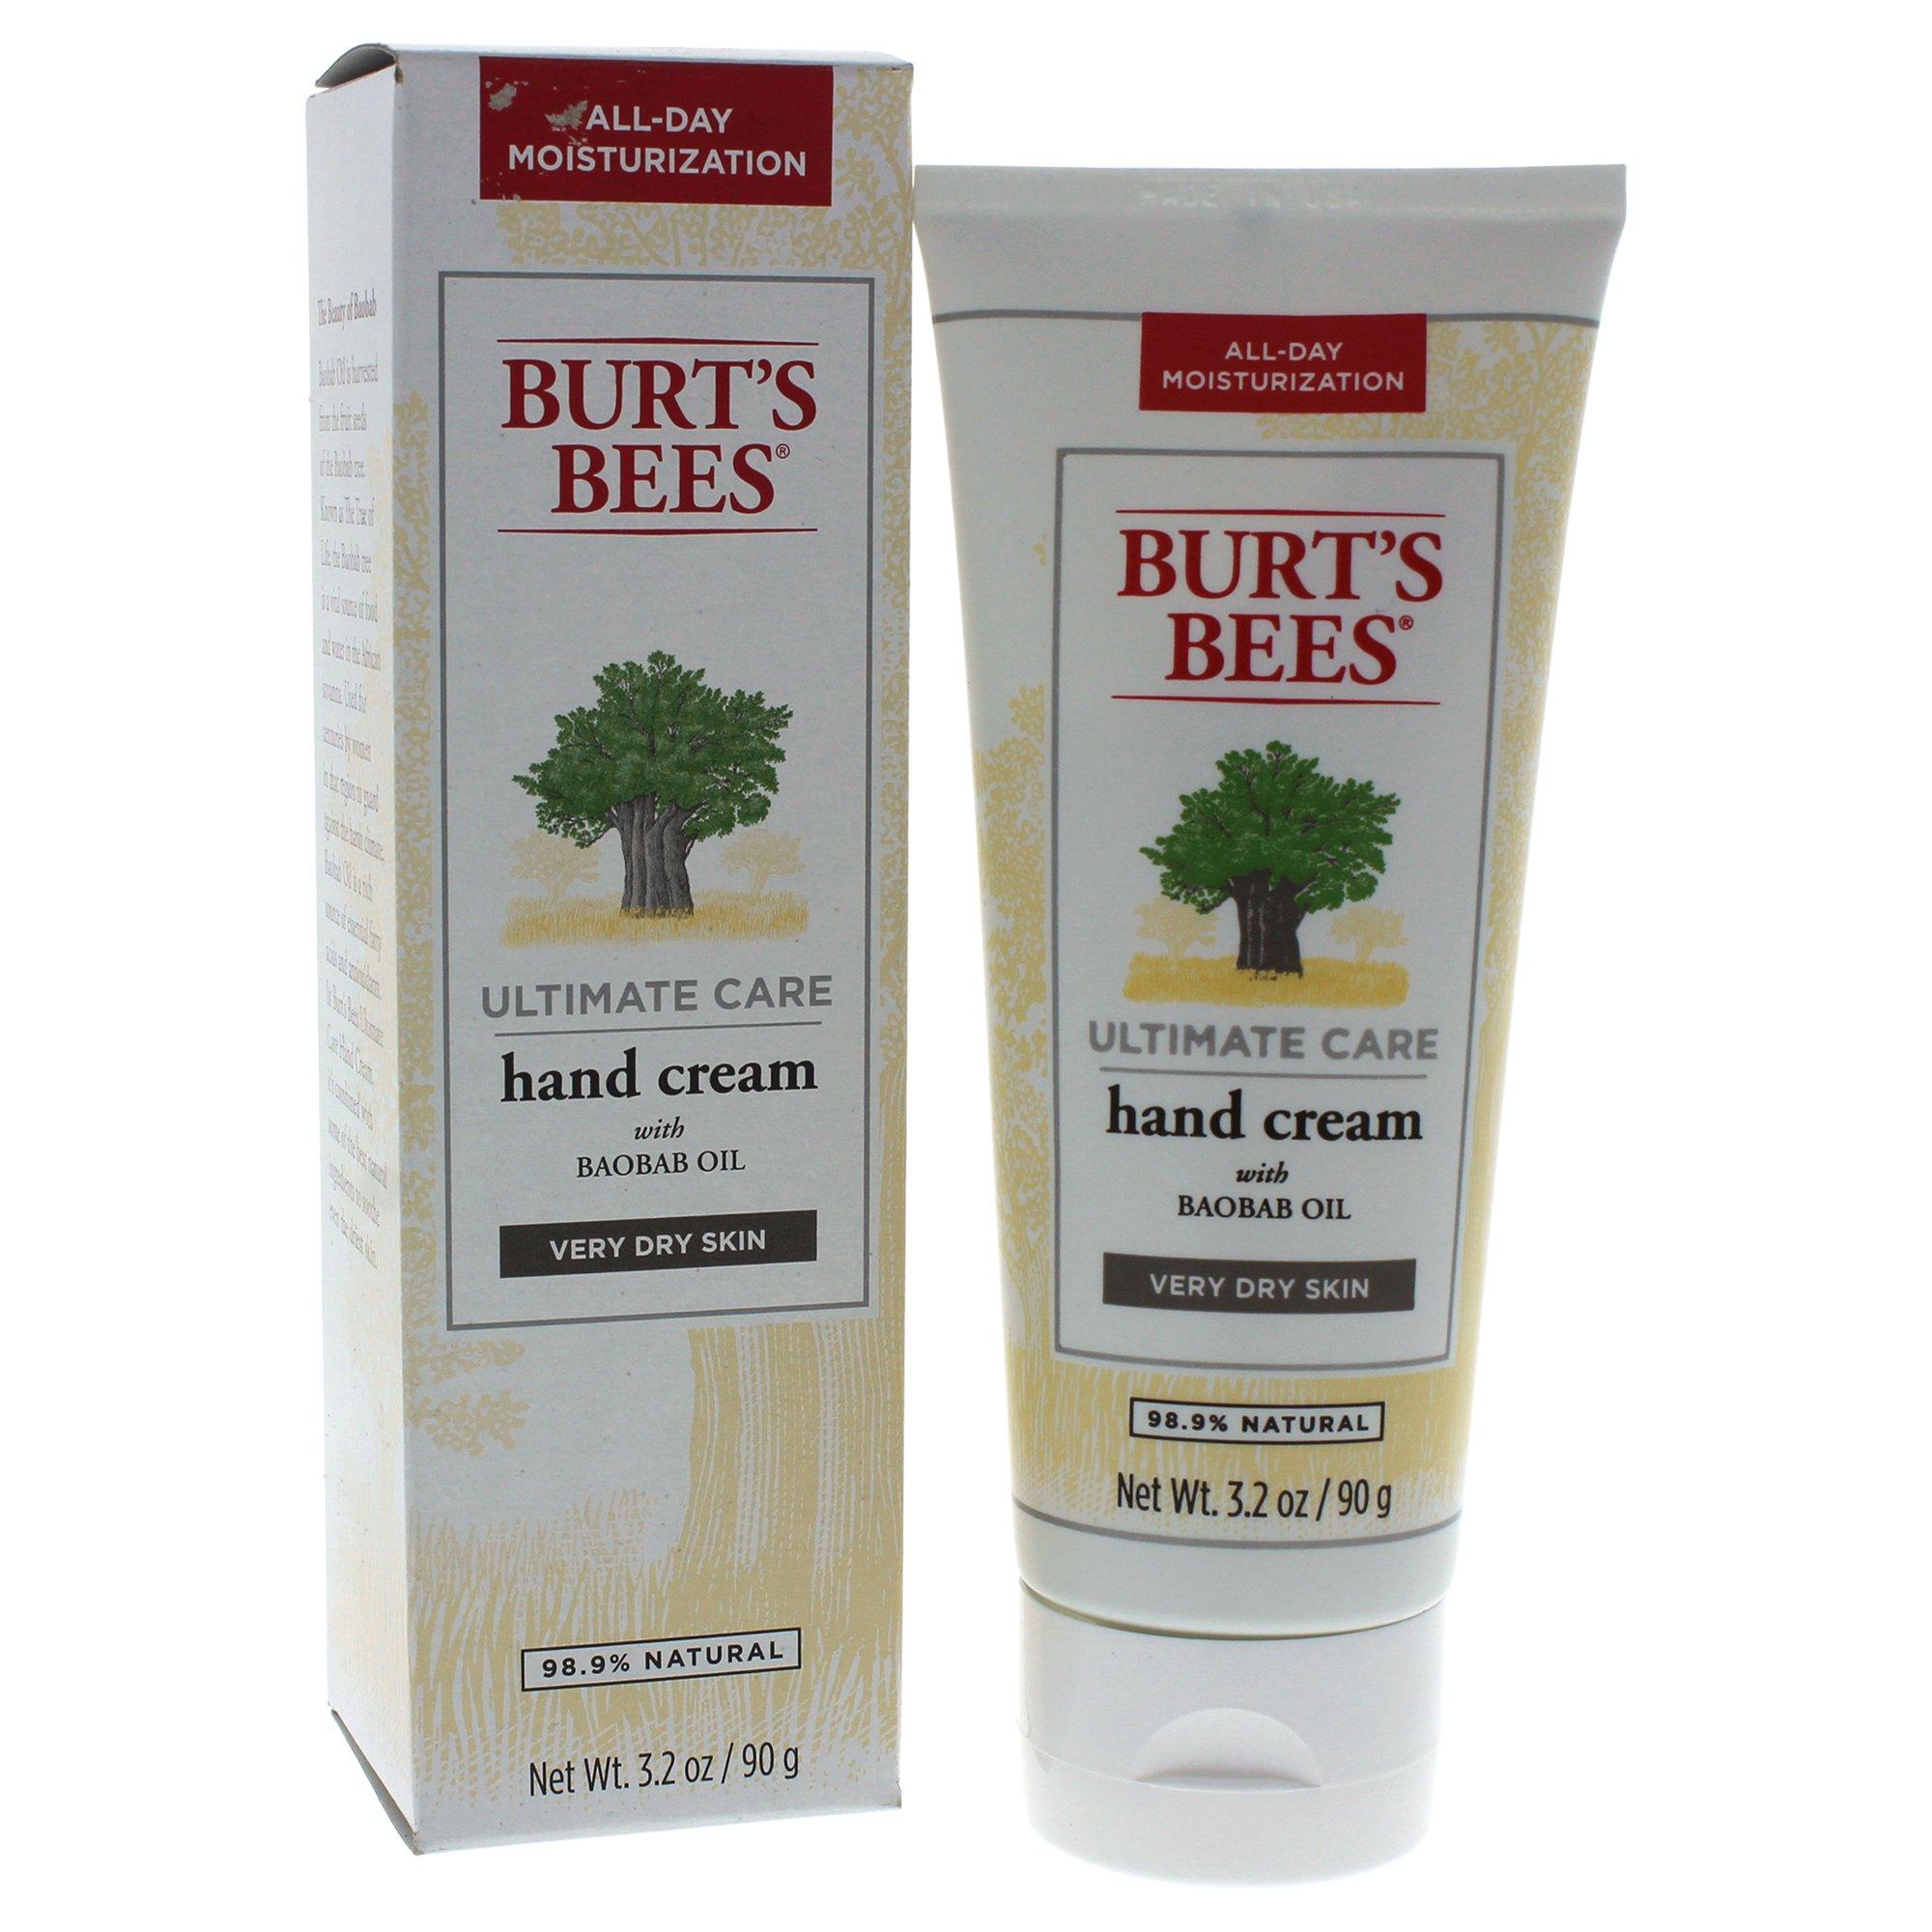 Burt's Bees Ultimate Care Hand Cream, 3.2 Ounces